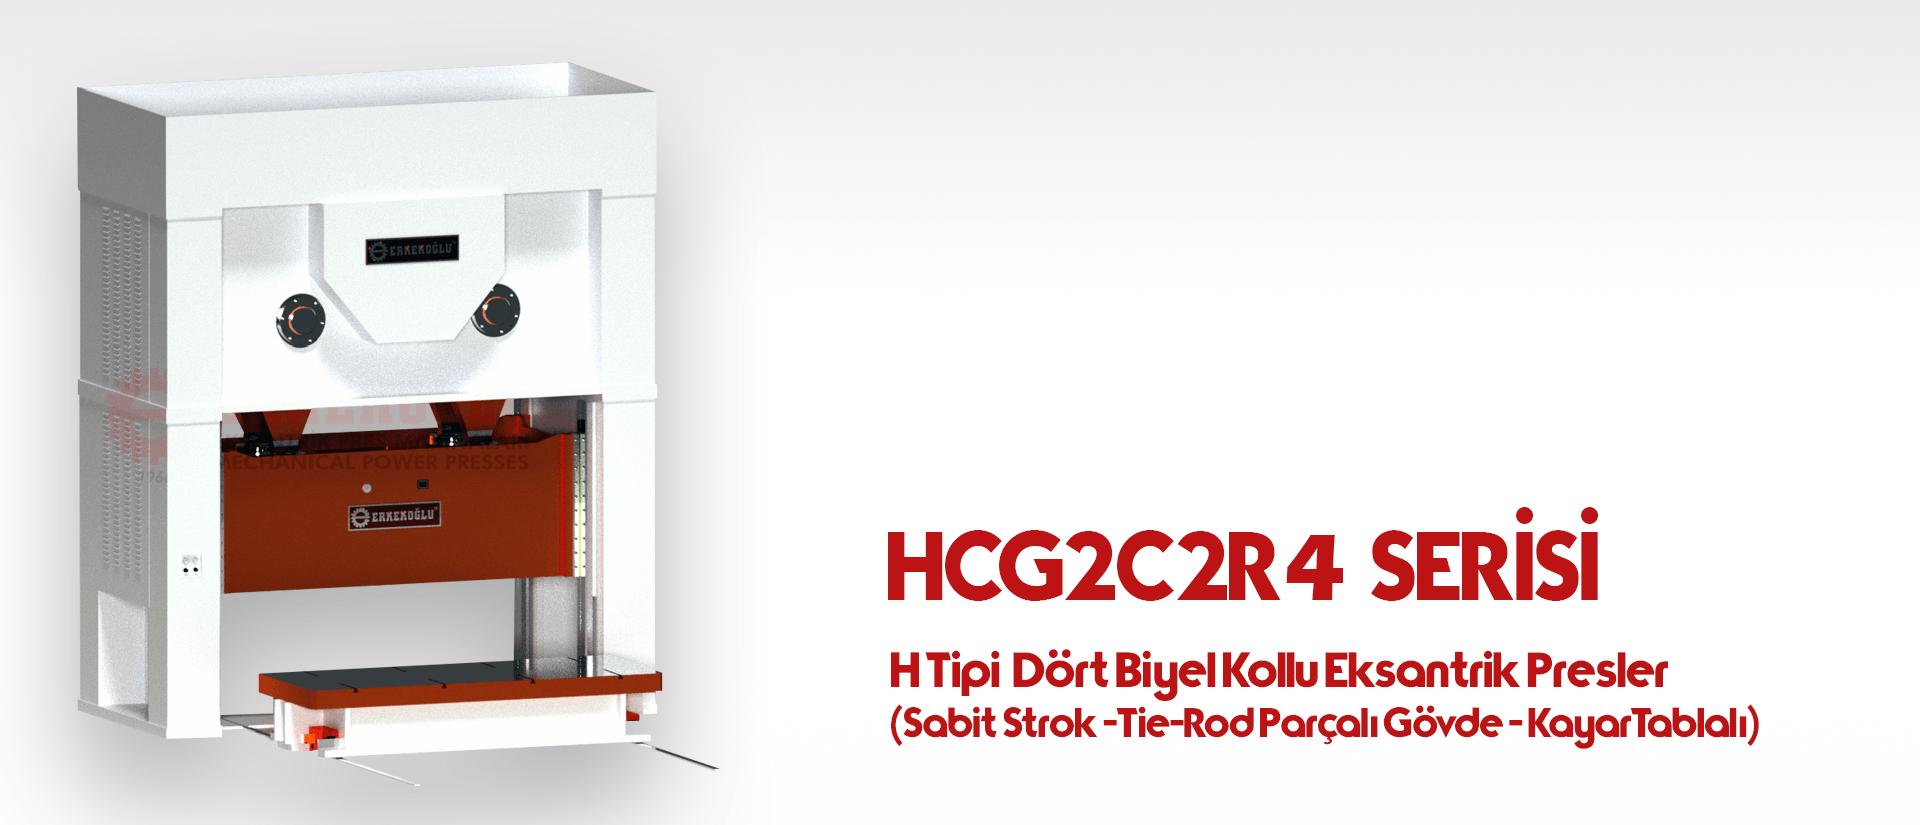 HCG2C2R4-tr-2